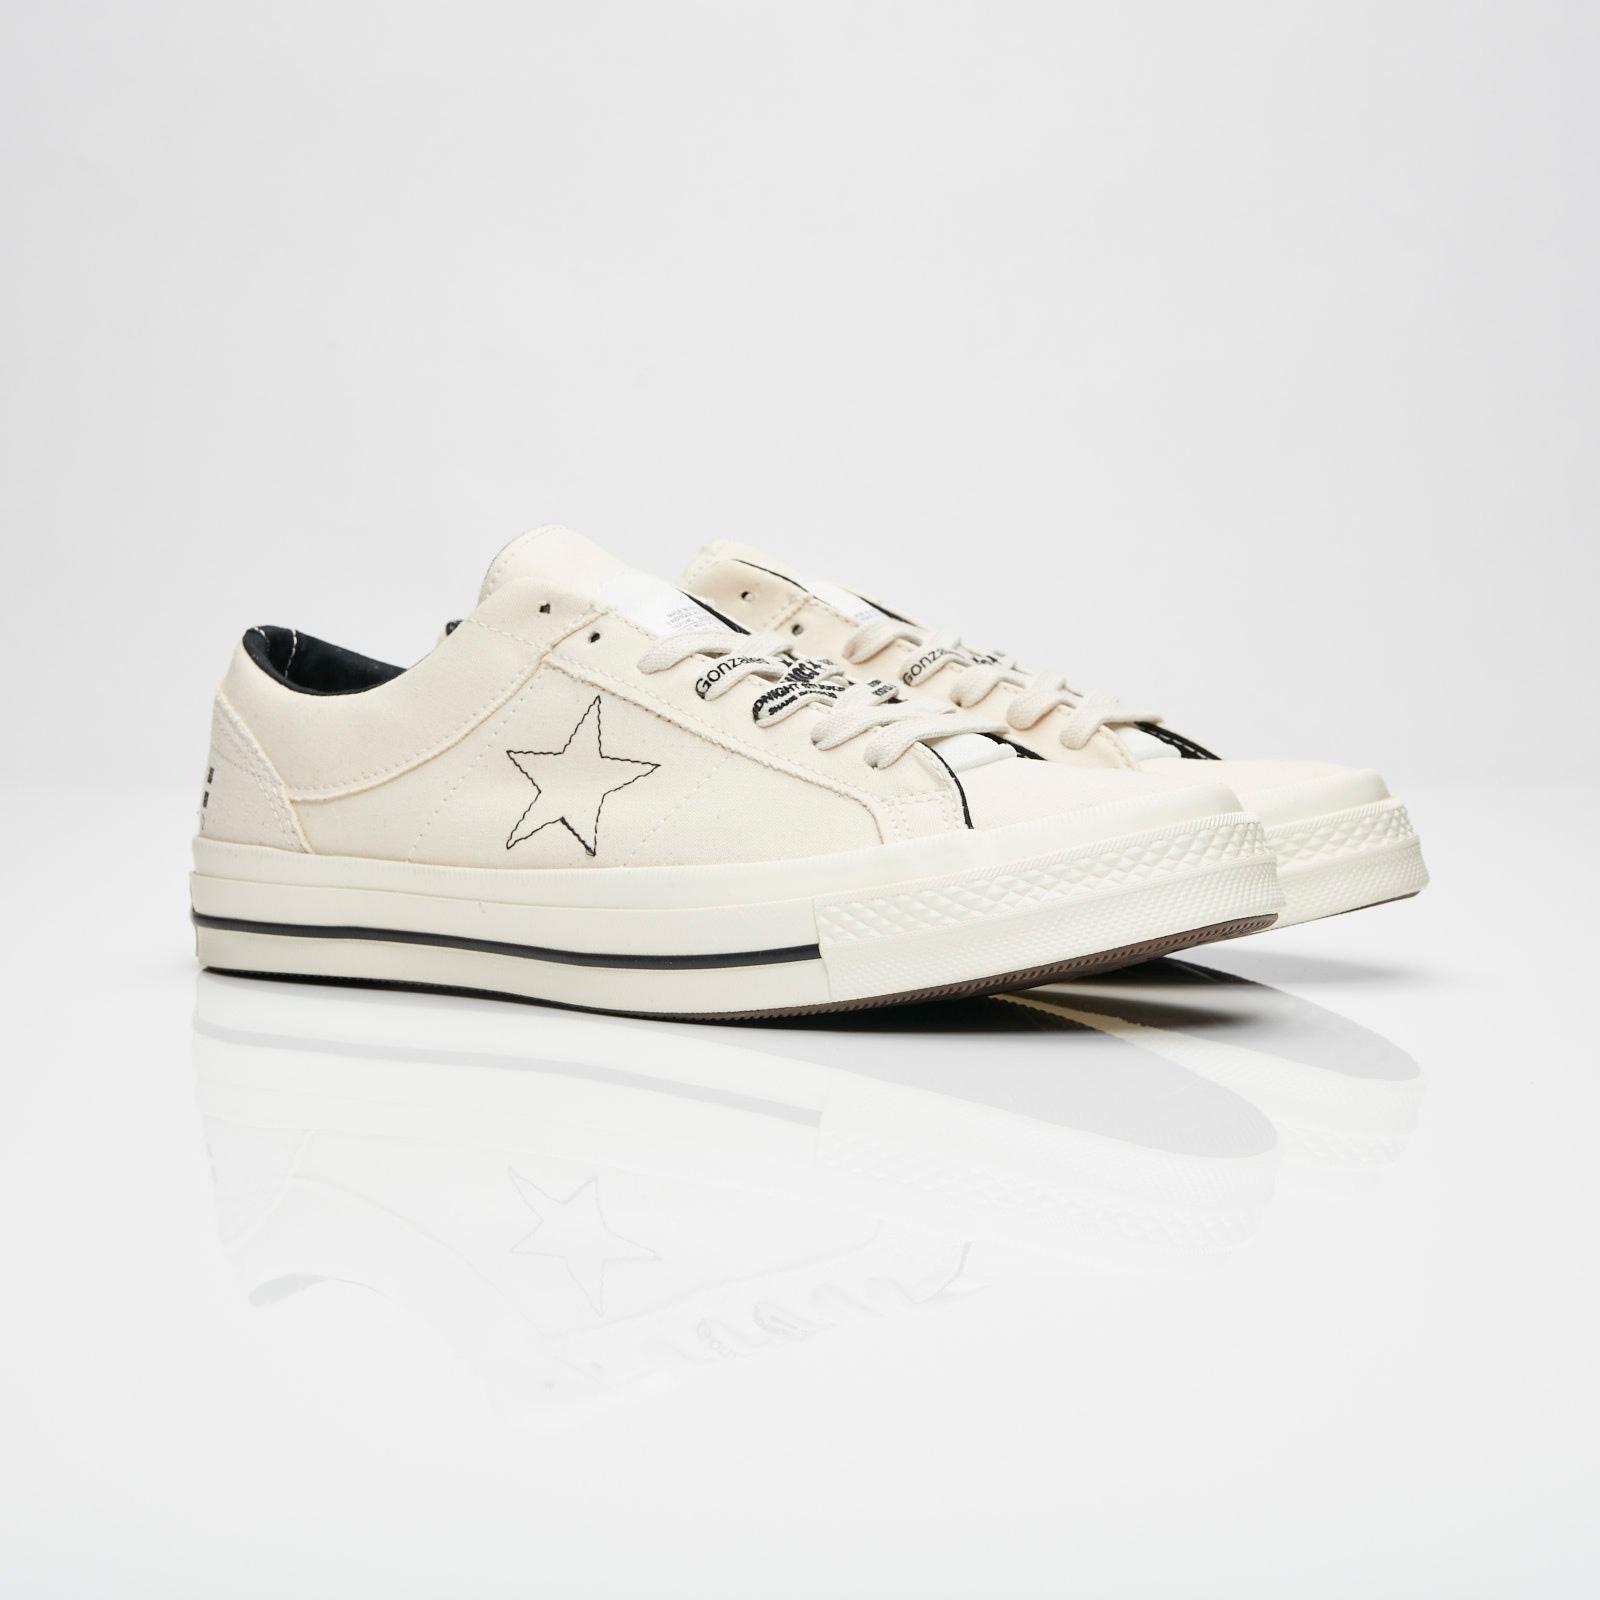 Converse One Star x Midnight Studio - 162124c - Sneakersnstuff ... 831ffae61